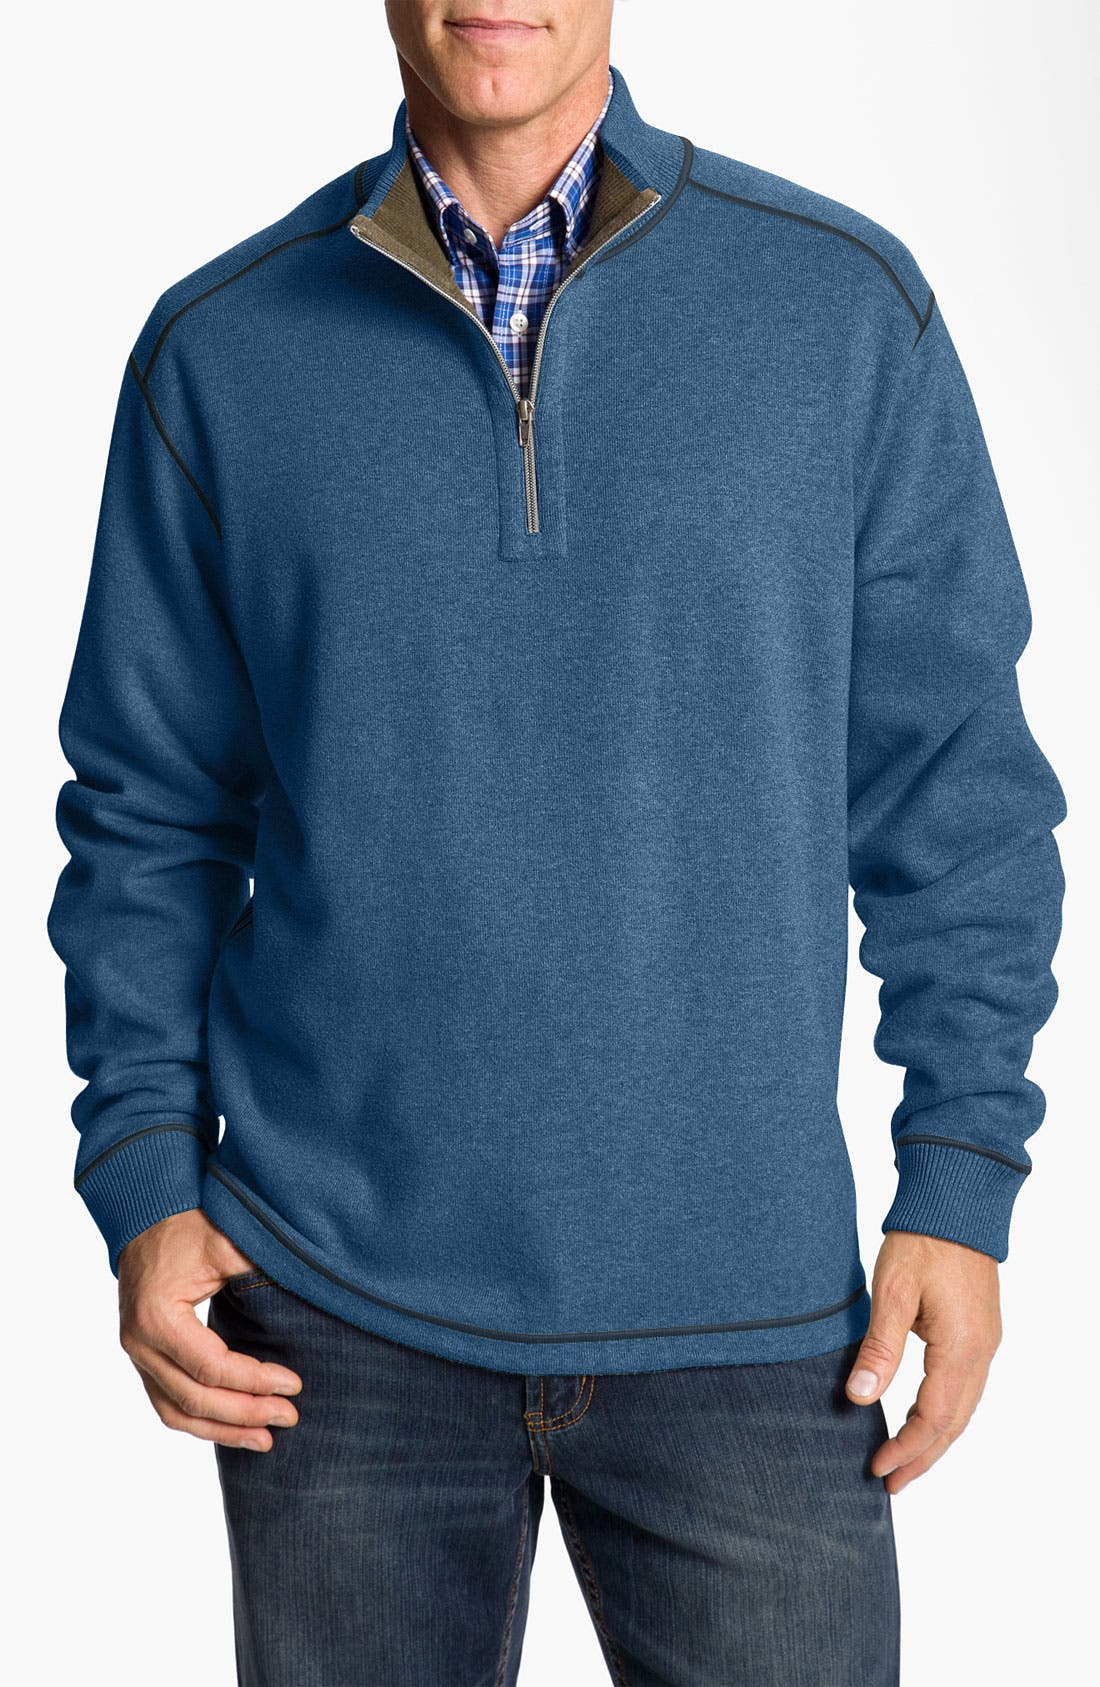 Main Image - Cutter & Buck 'Essex' Reversible Half Zip Sweatshirt (Big & Tall)